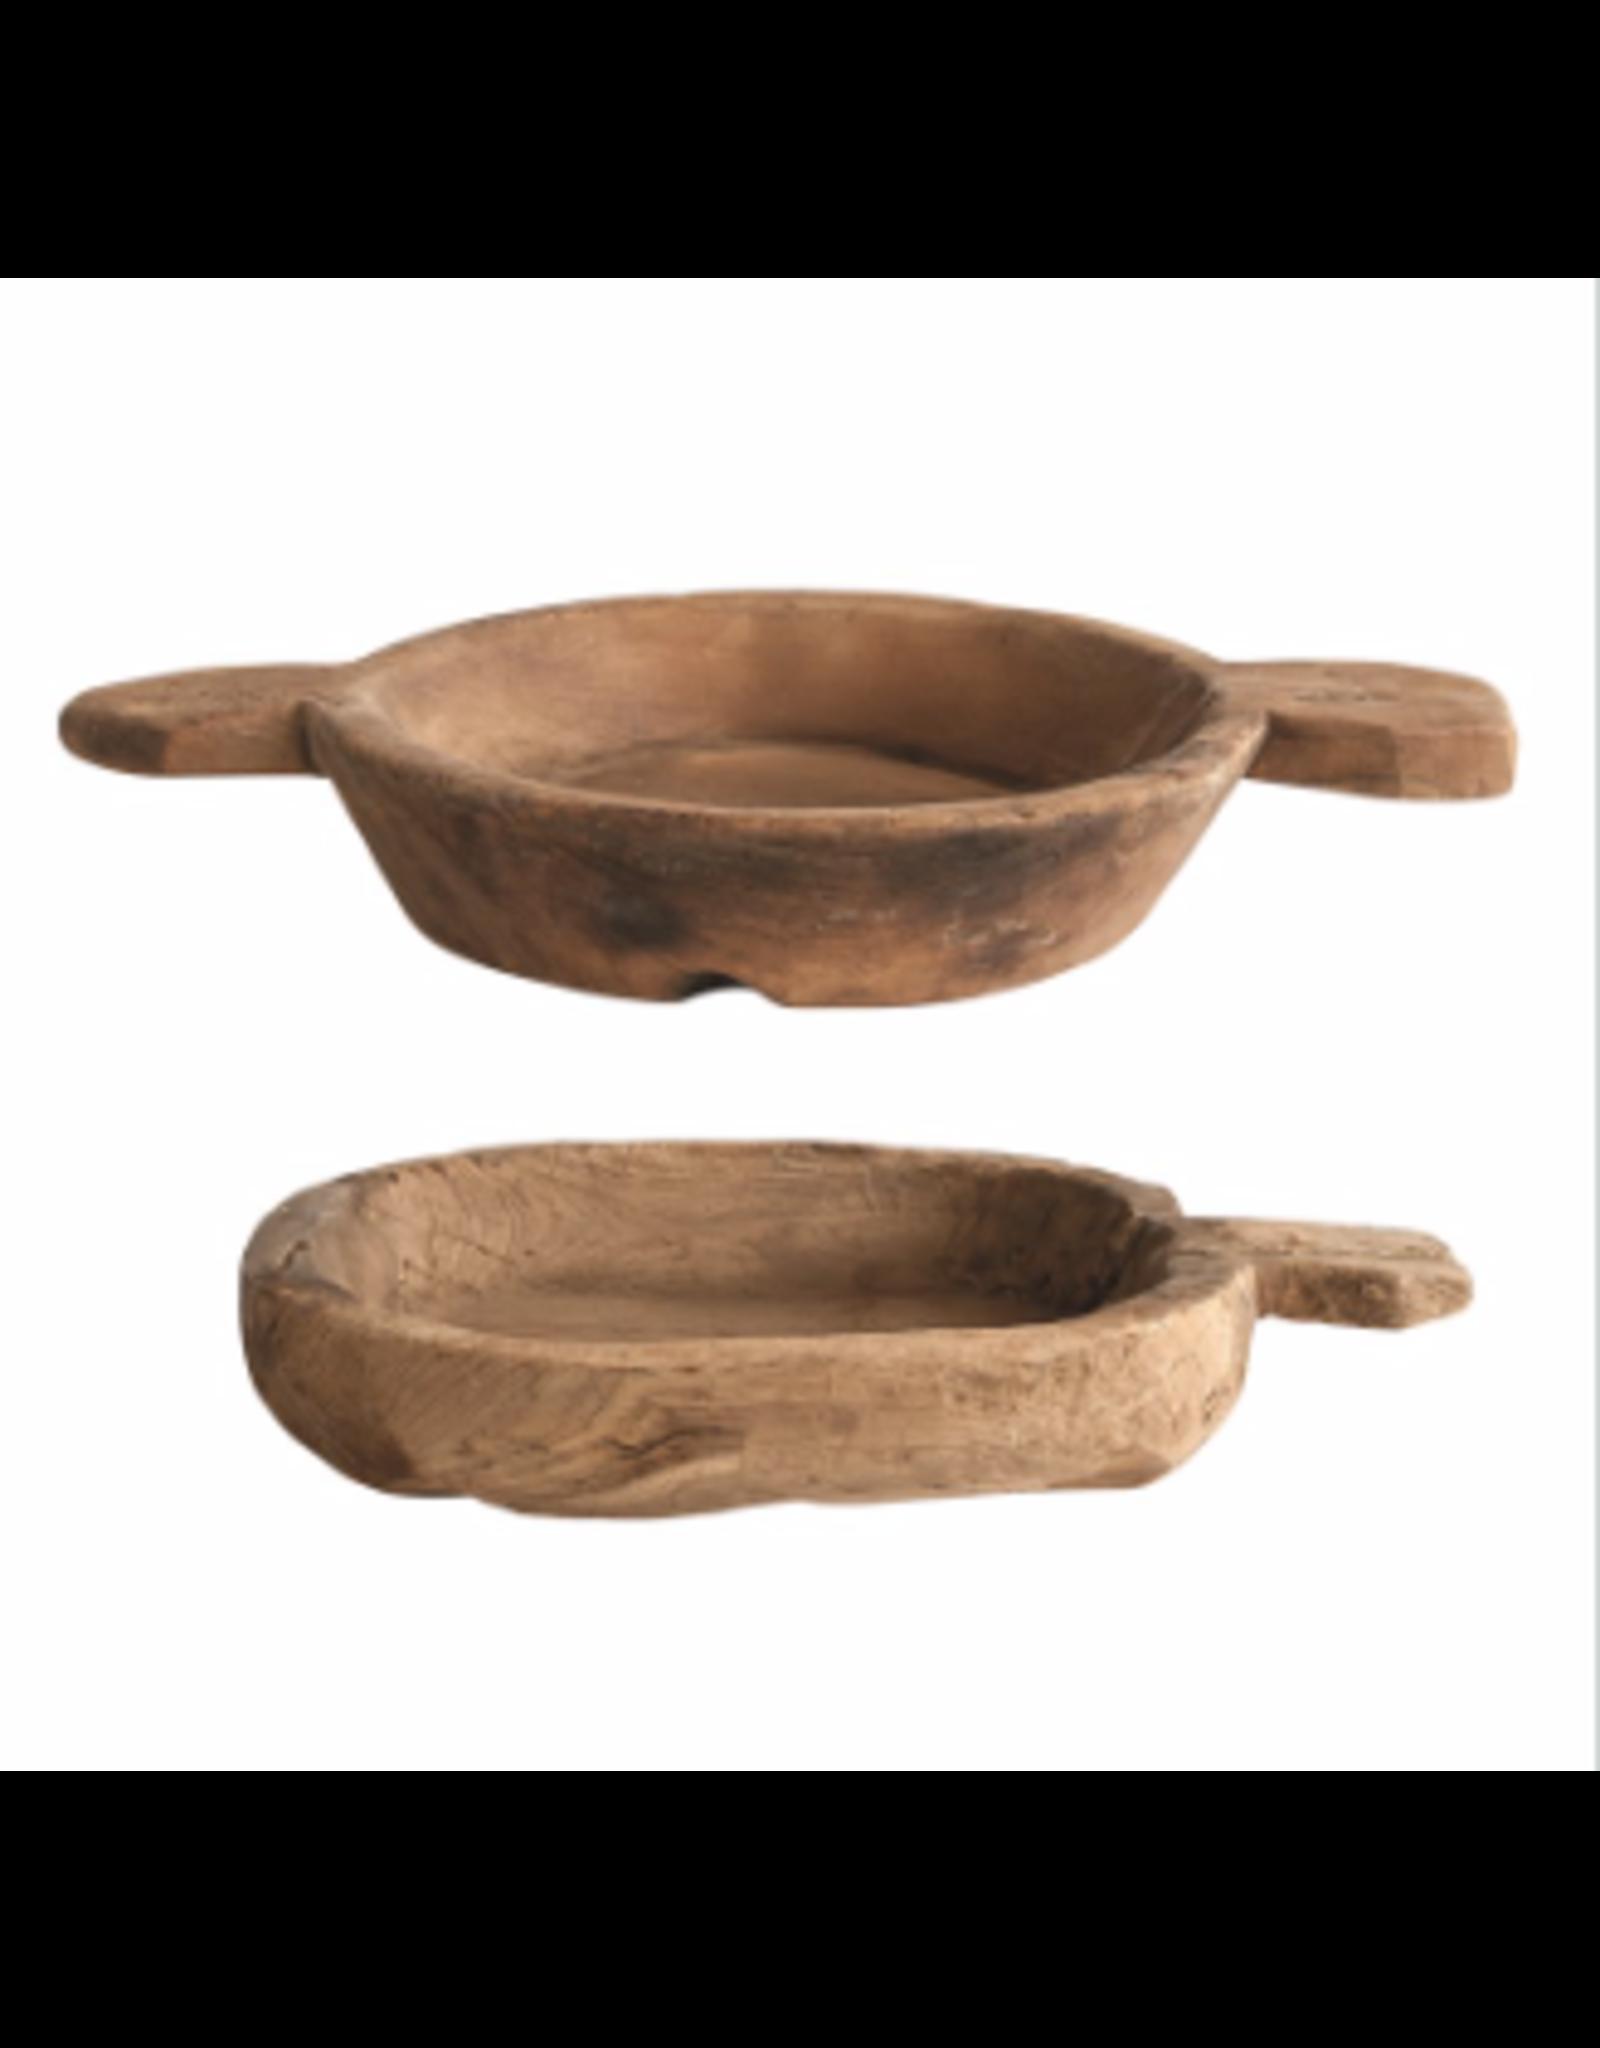 Found Decorative Wood Bowl - small